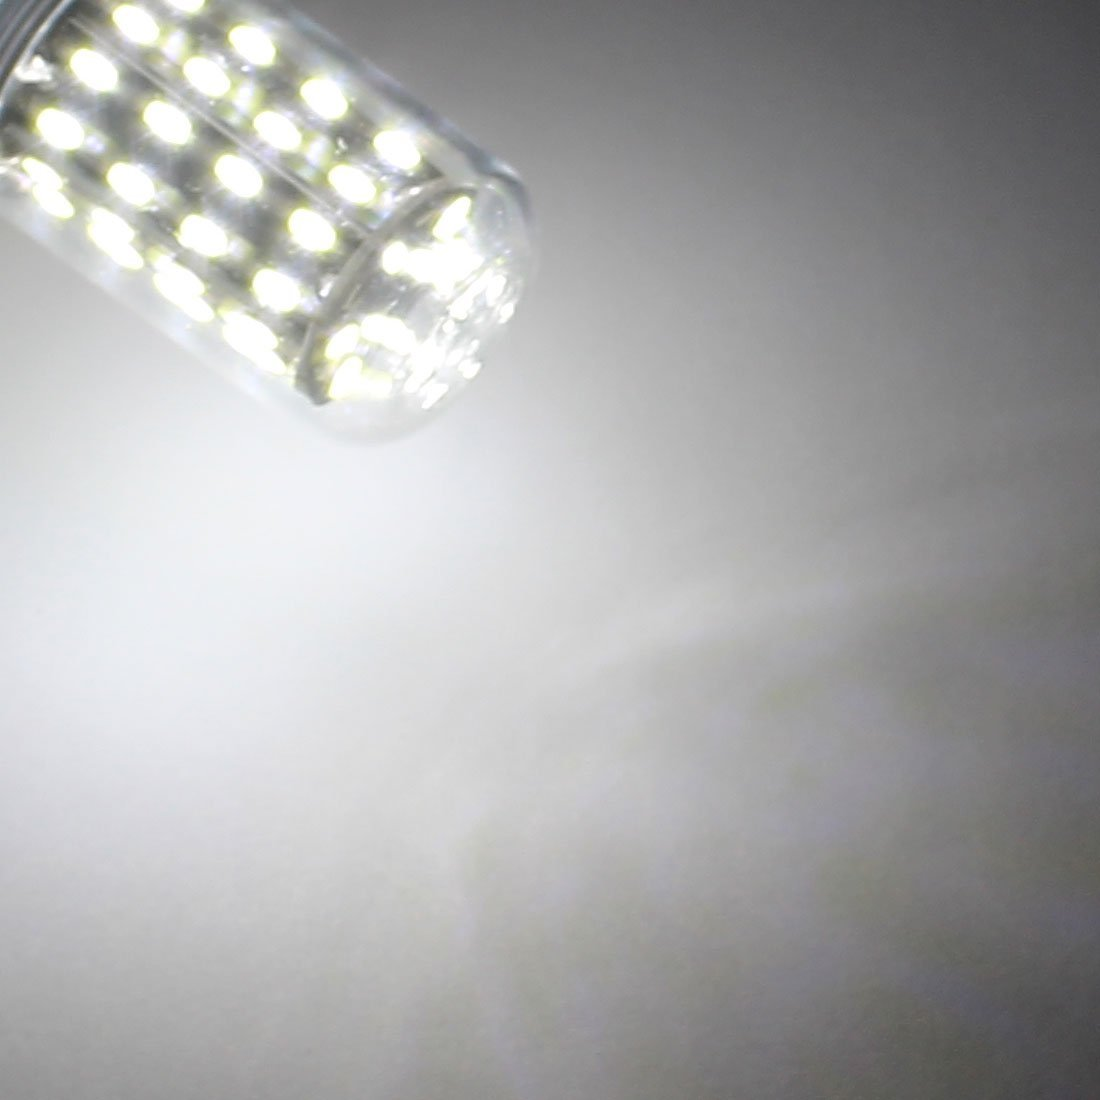 eDealMax AC85-265V 5W x 56 5730SMD E14 del maíz del LED bombilla de la lámpara ahorro de energía blanca pura - - Amazon.com